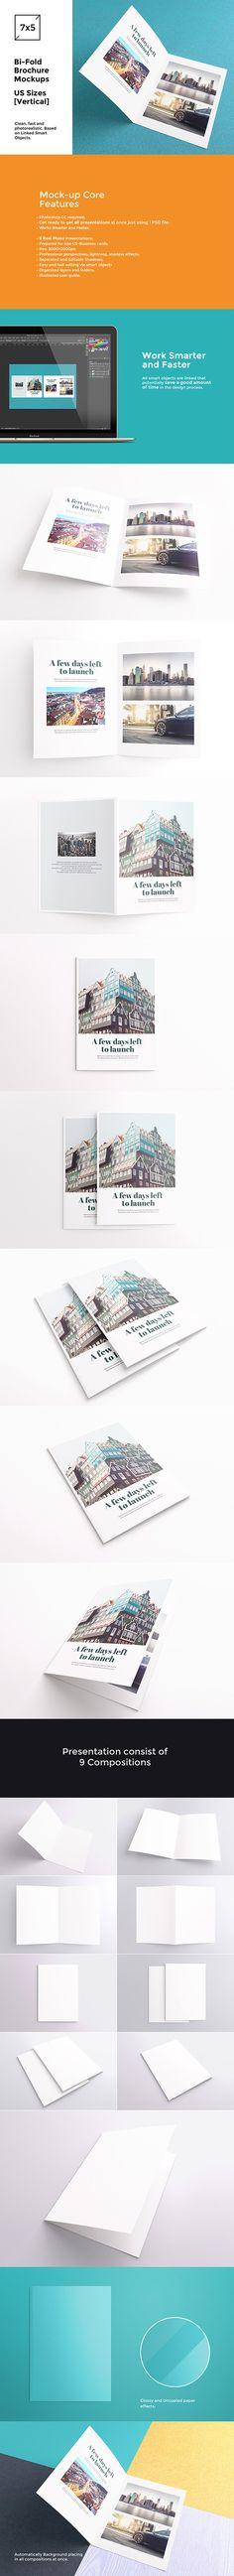 Bi-Fold Brochure / Flyer Mockups by itembridge creative store on @creativemarket